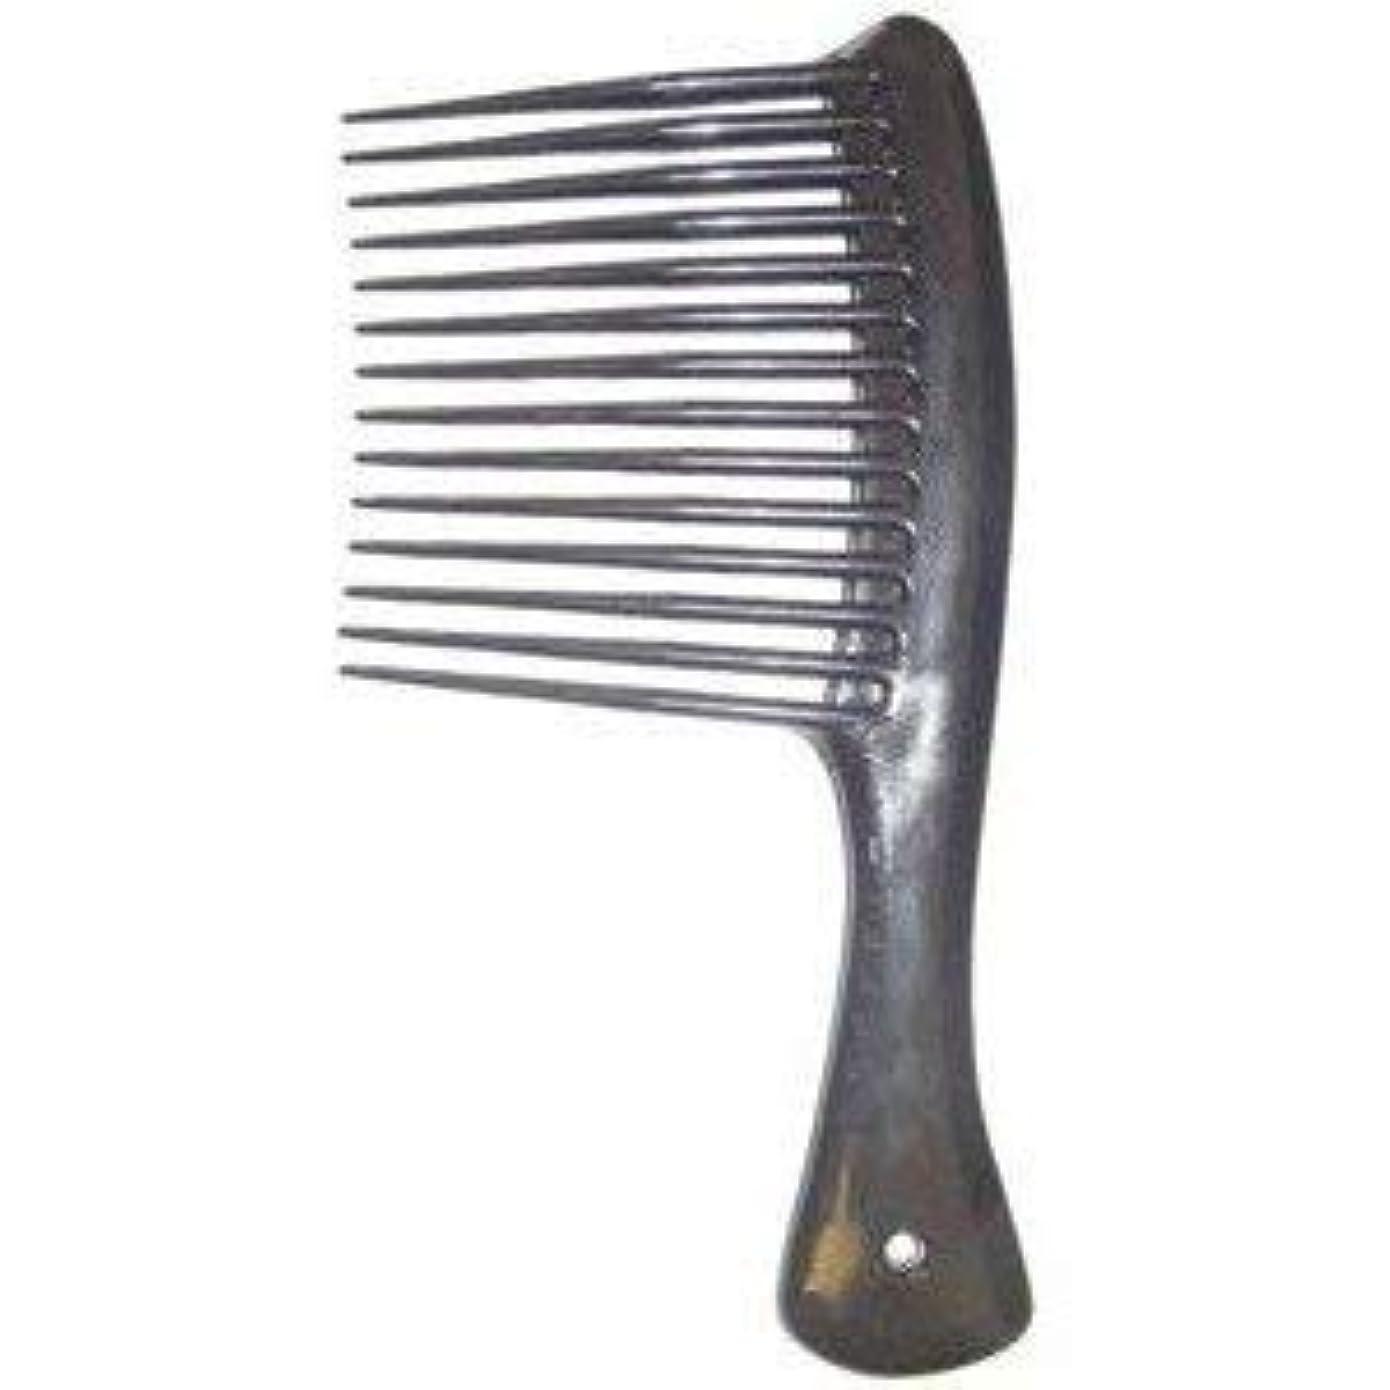 知性常習的北東Large Tooth Shampoo Detangling Comb Rack Hair Comb (Black) [並行輸入品]